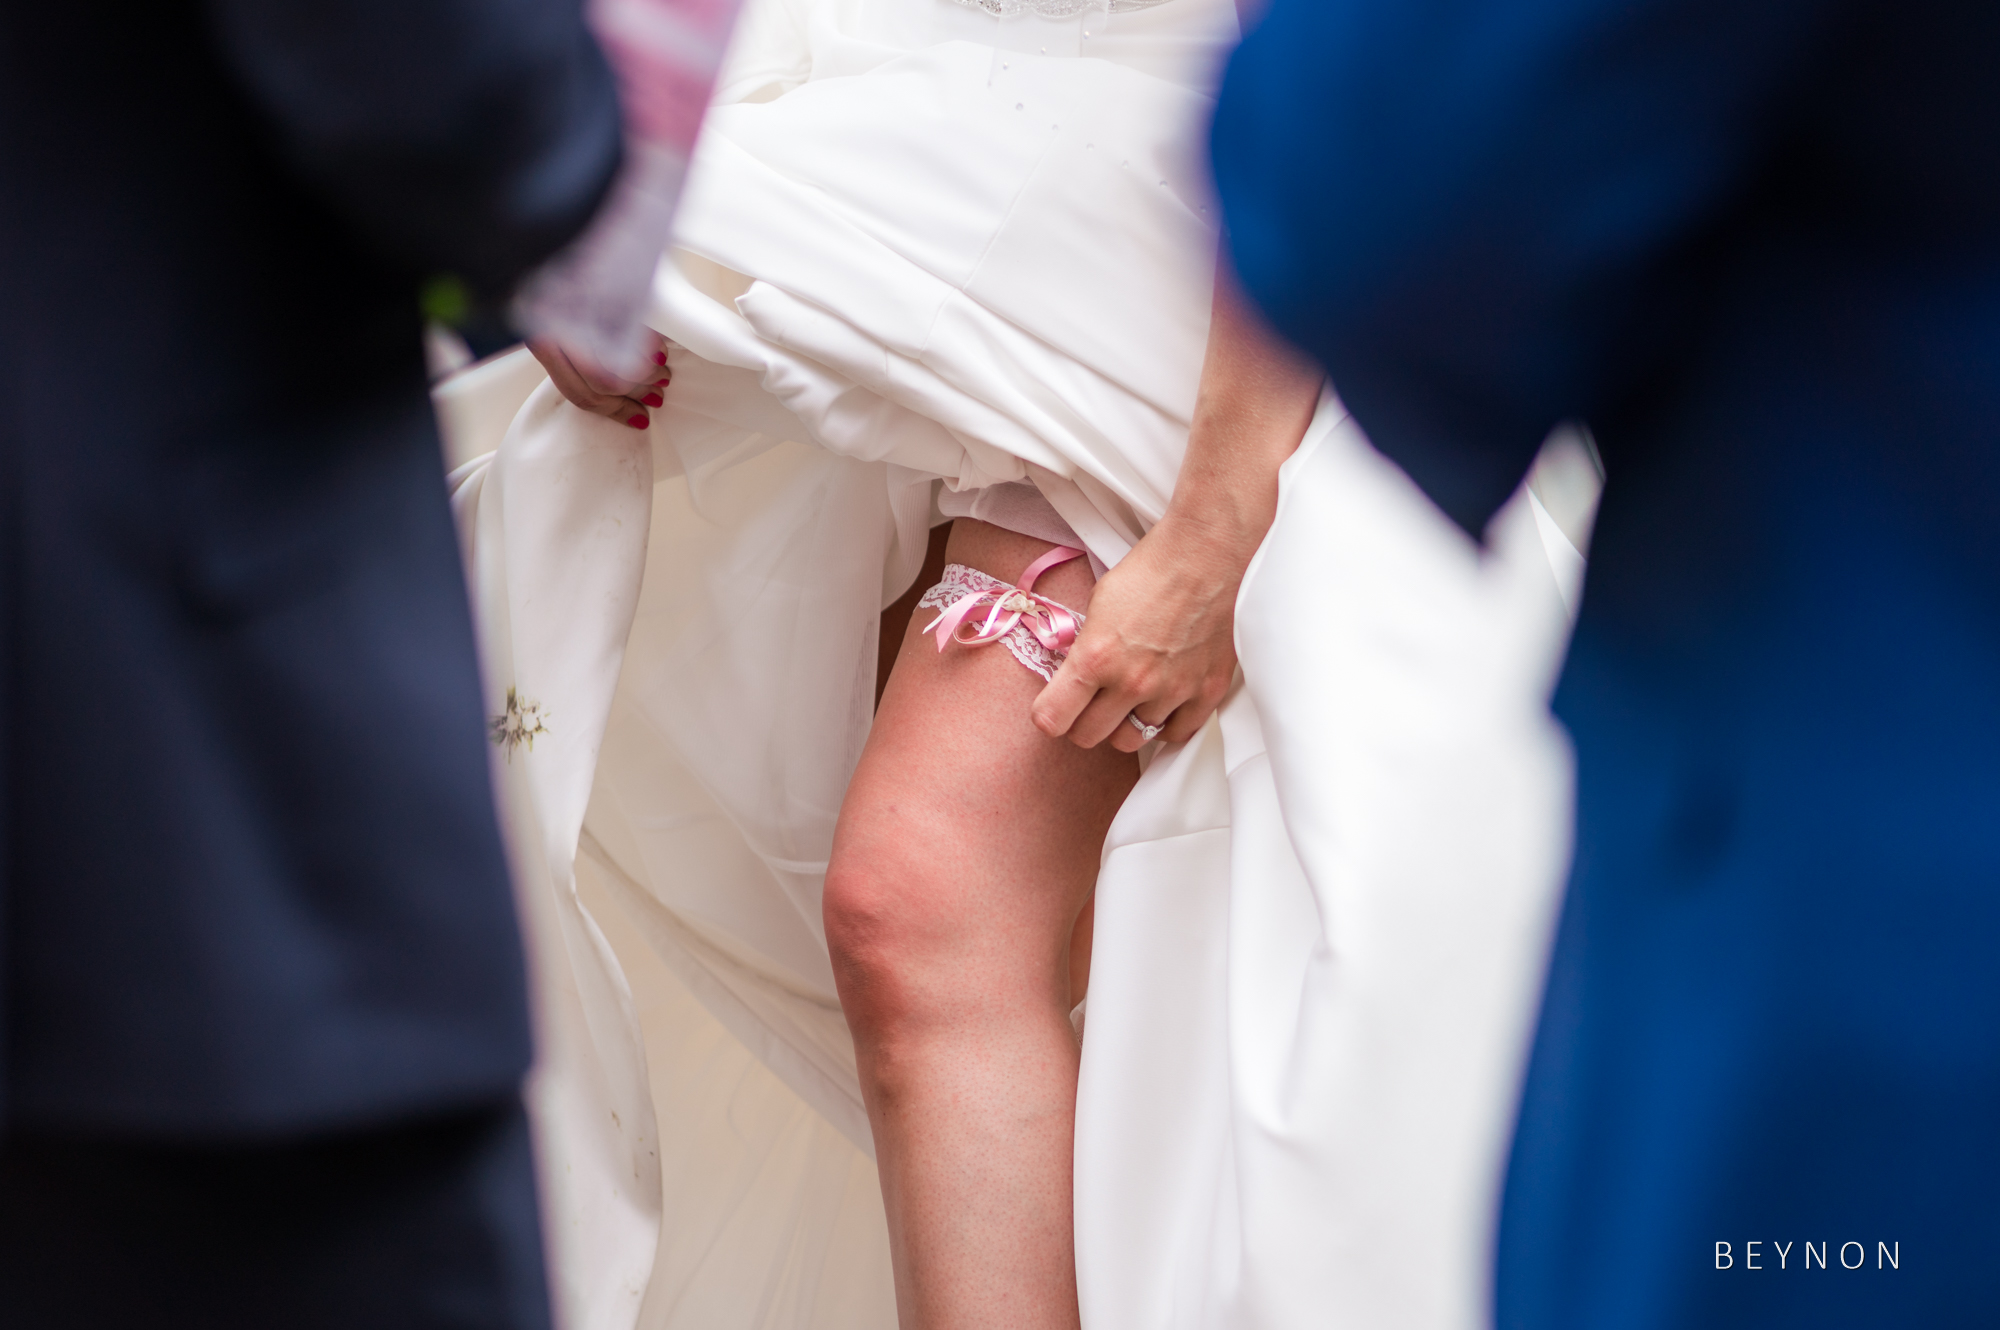 The bride show off her garter